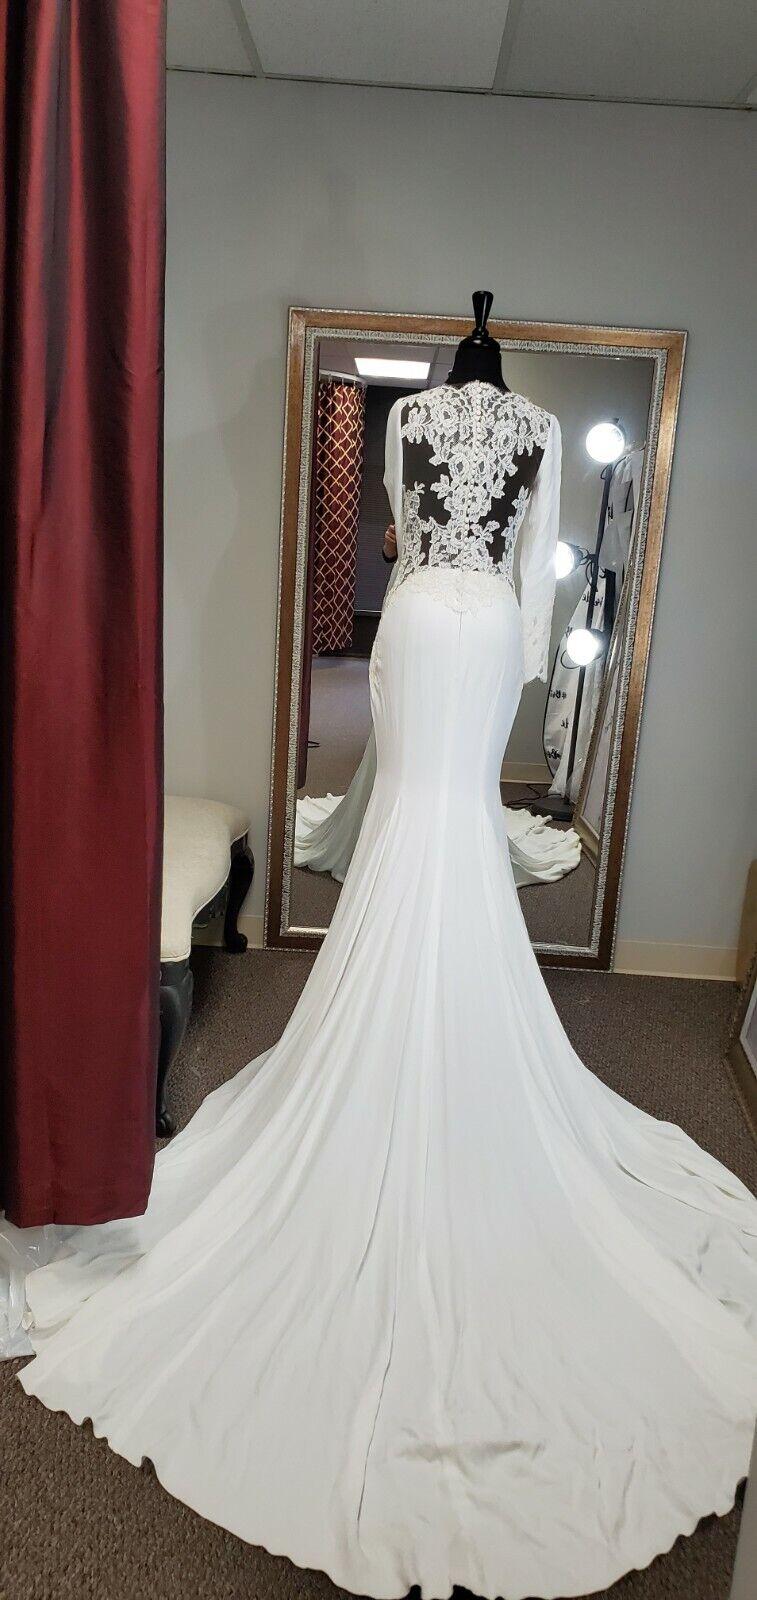 Pronovias Sample Wedding Dress Size USA 08